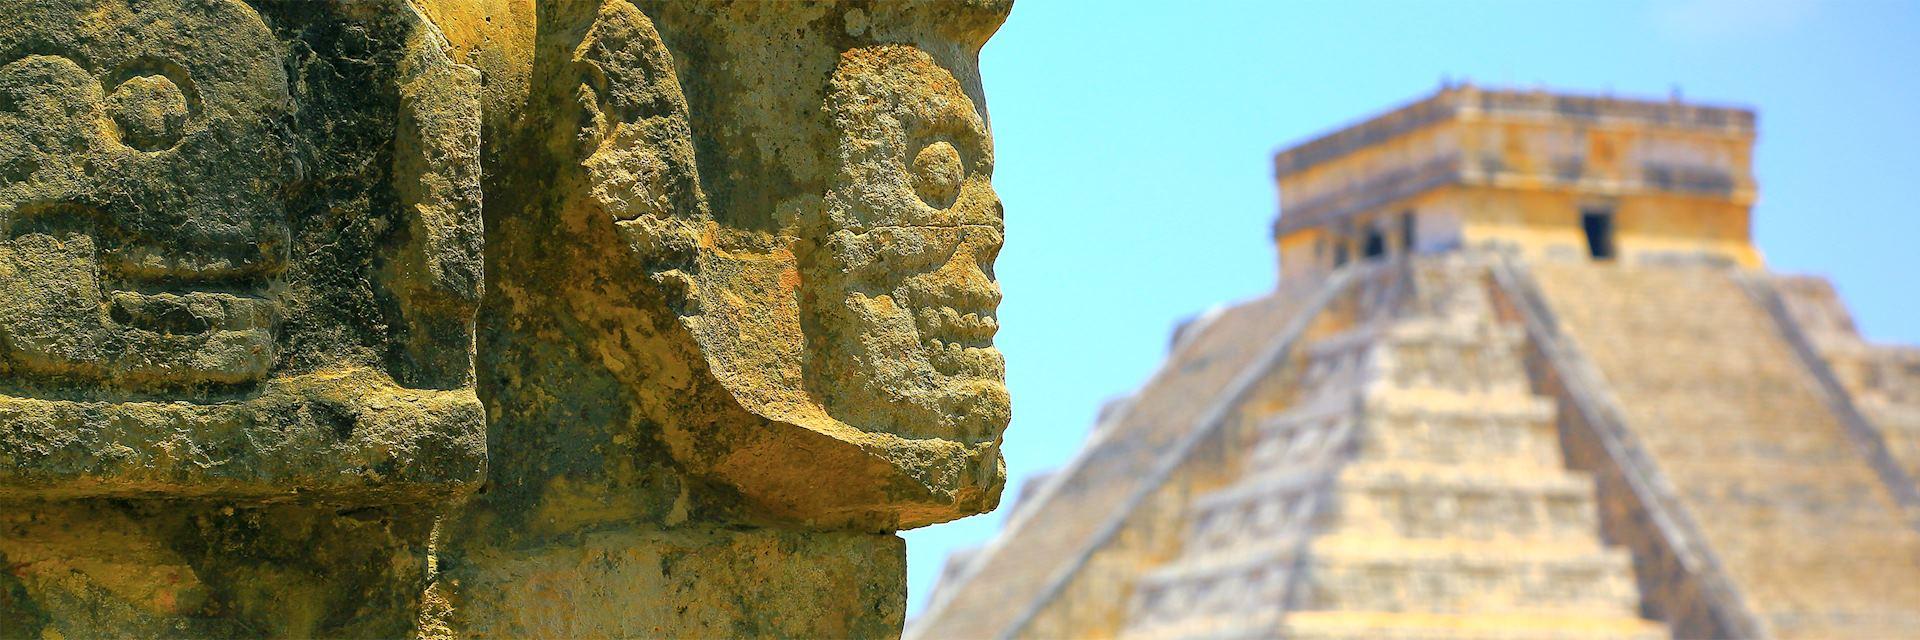 Kukulkan Pyramid at Chichén Itzá